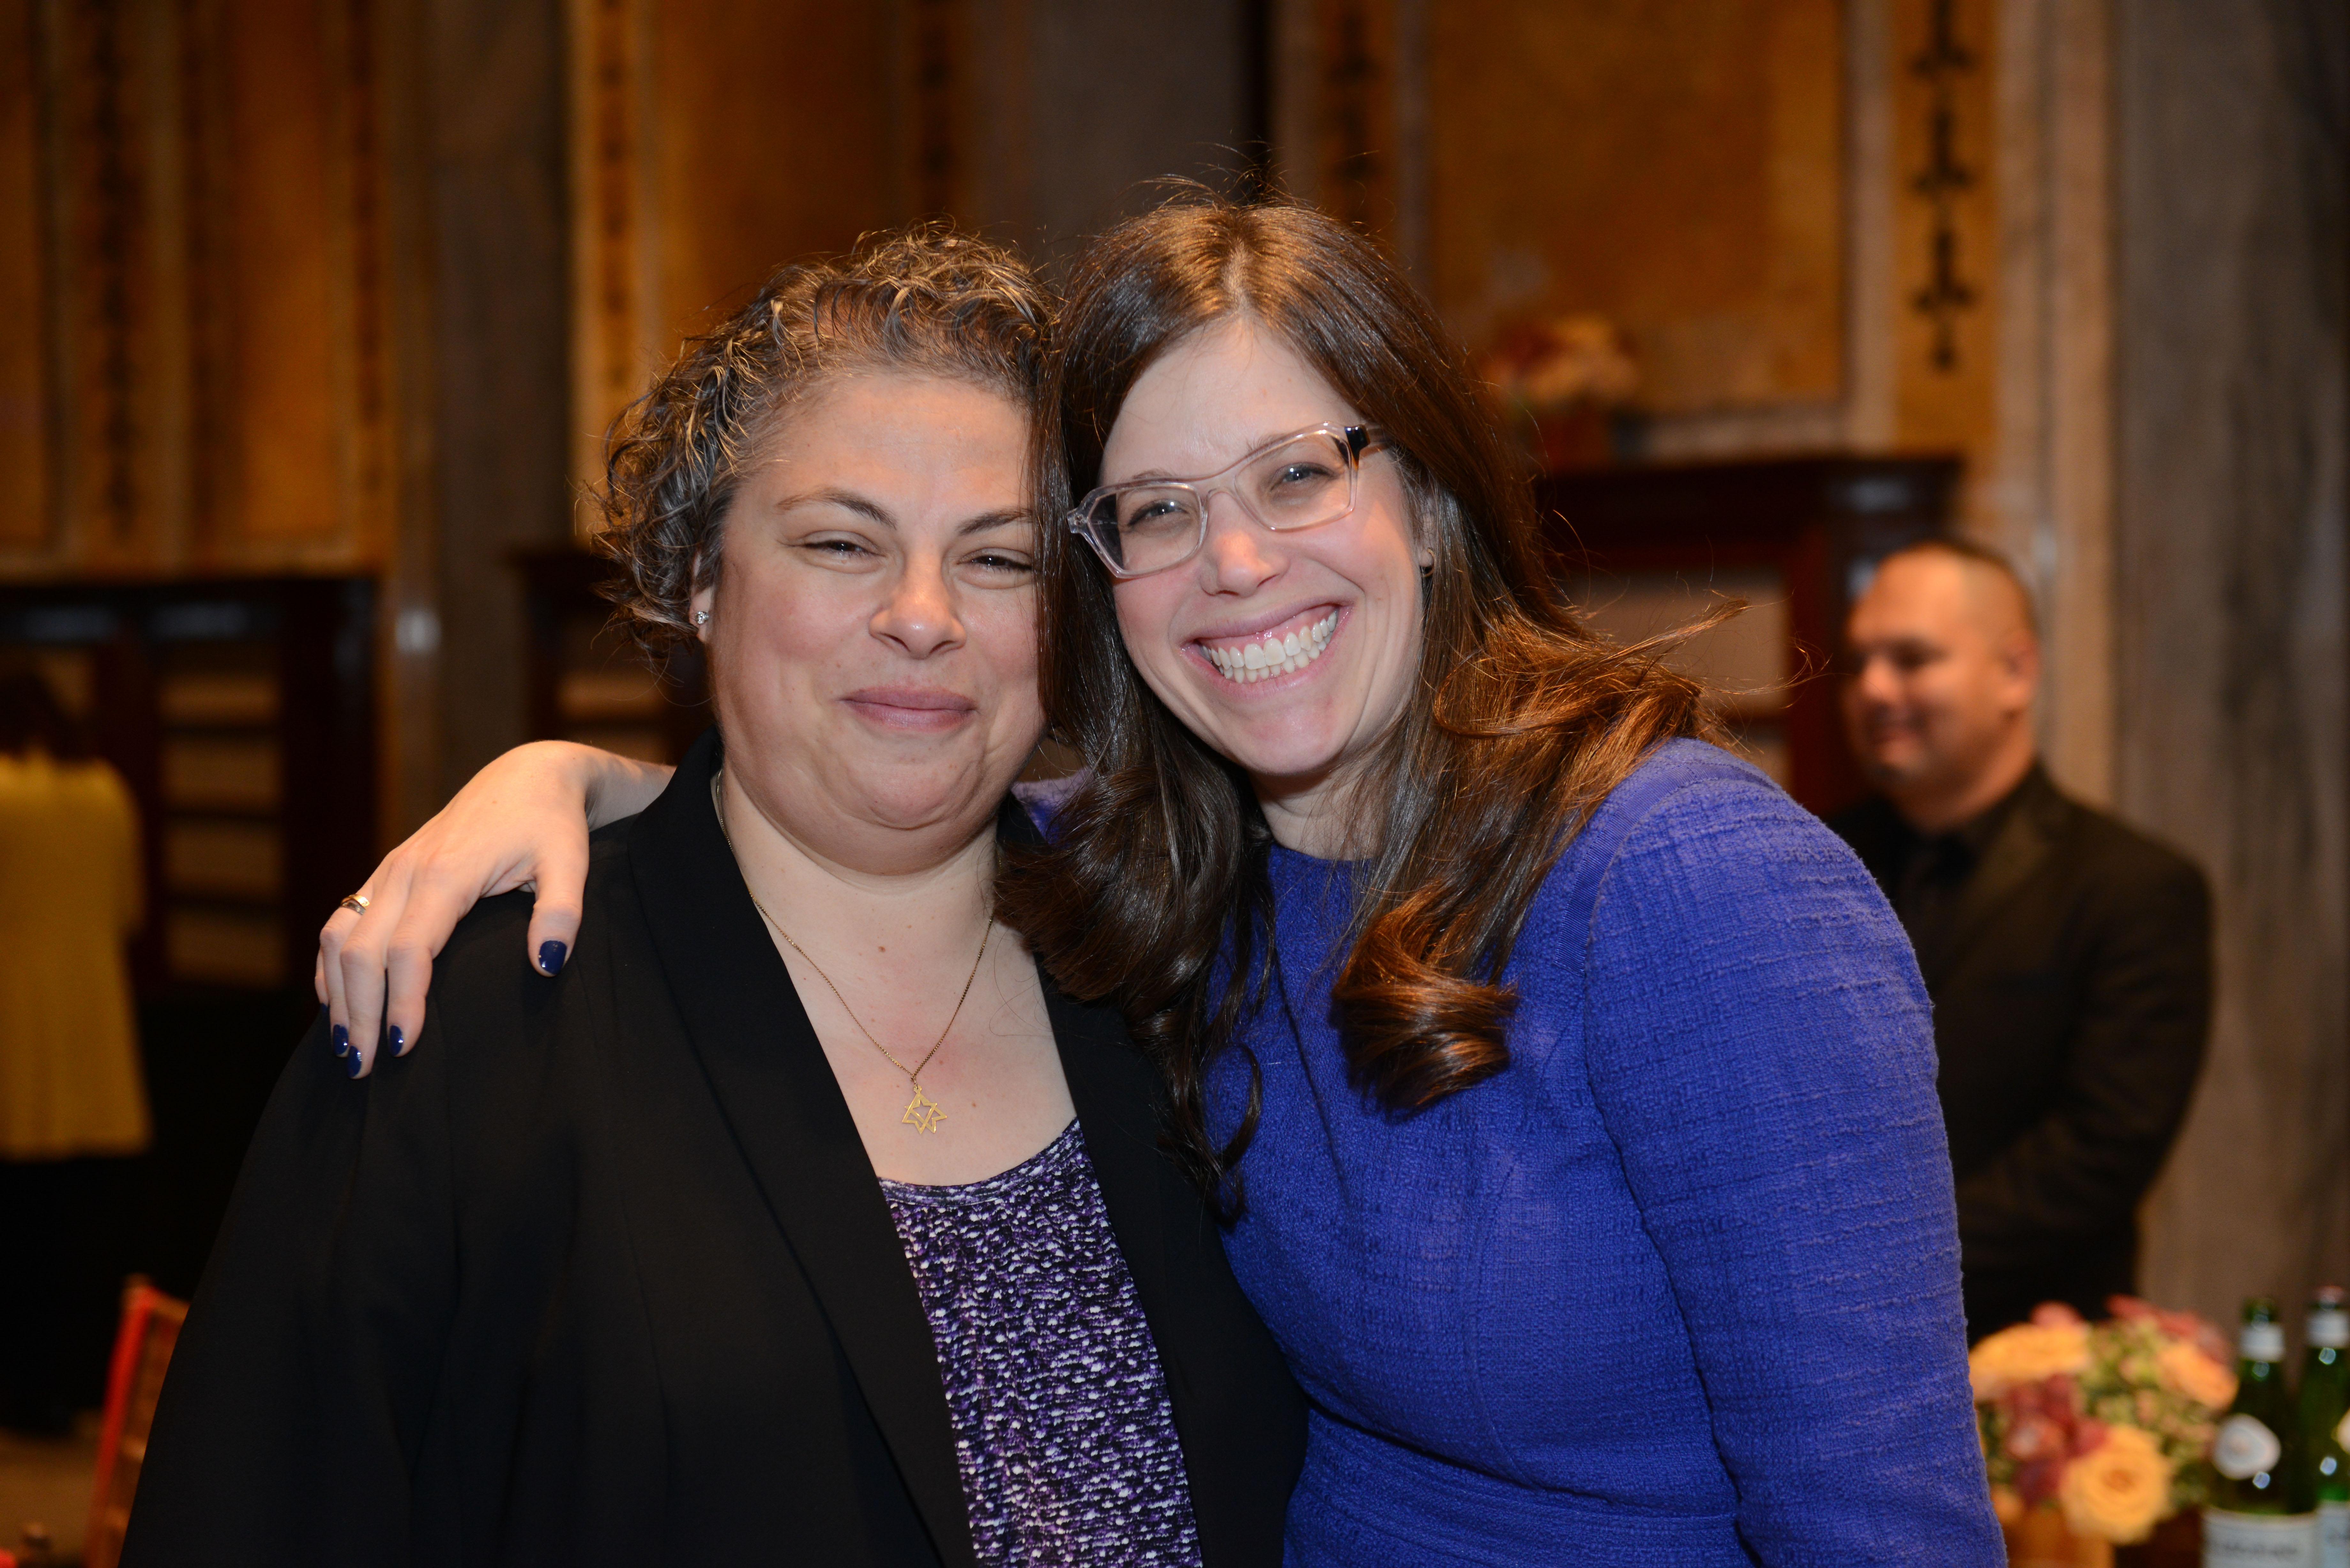 From left: Rabbi Melanie Levav and Sarah Raful Whinston.